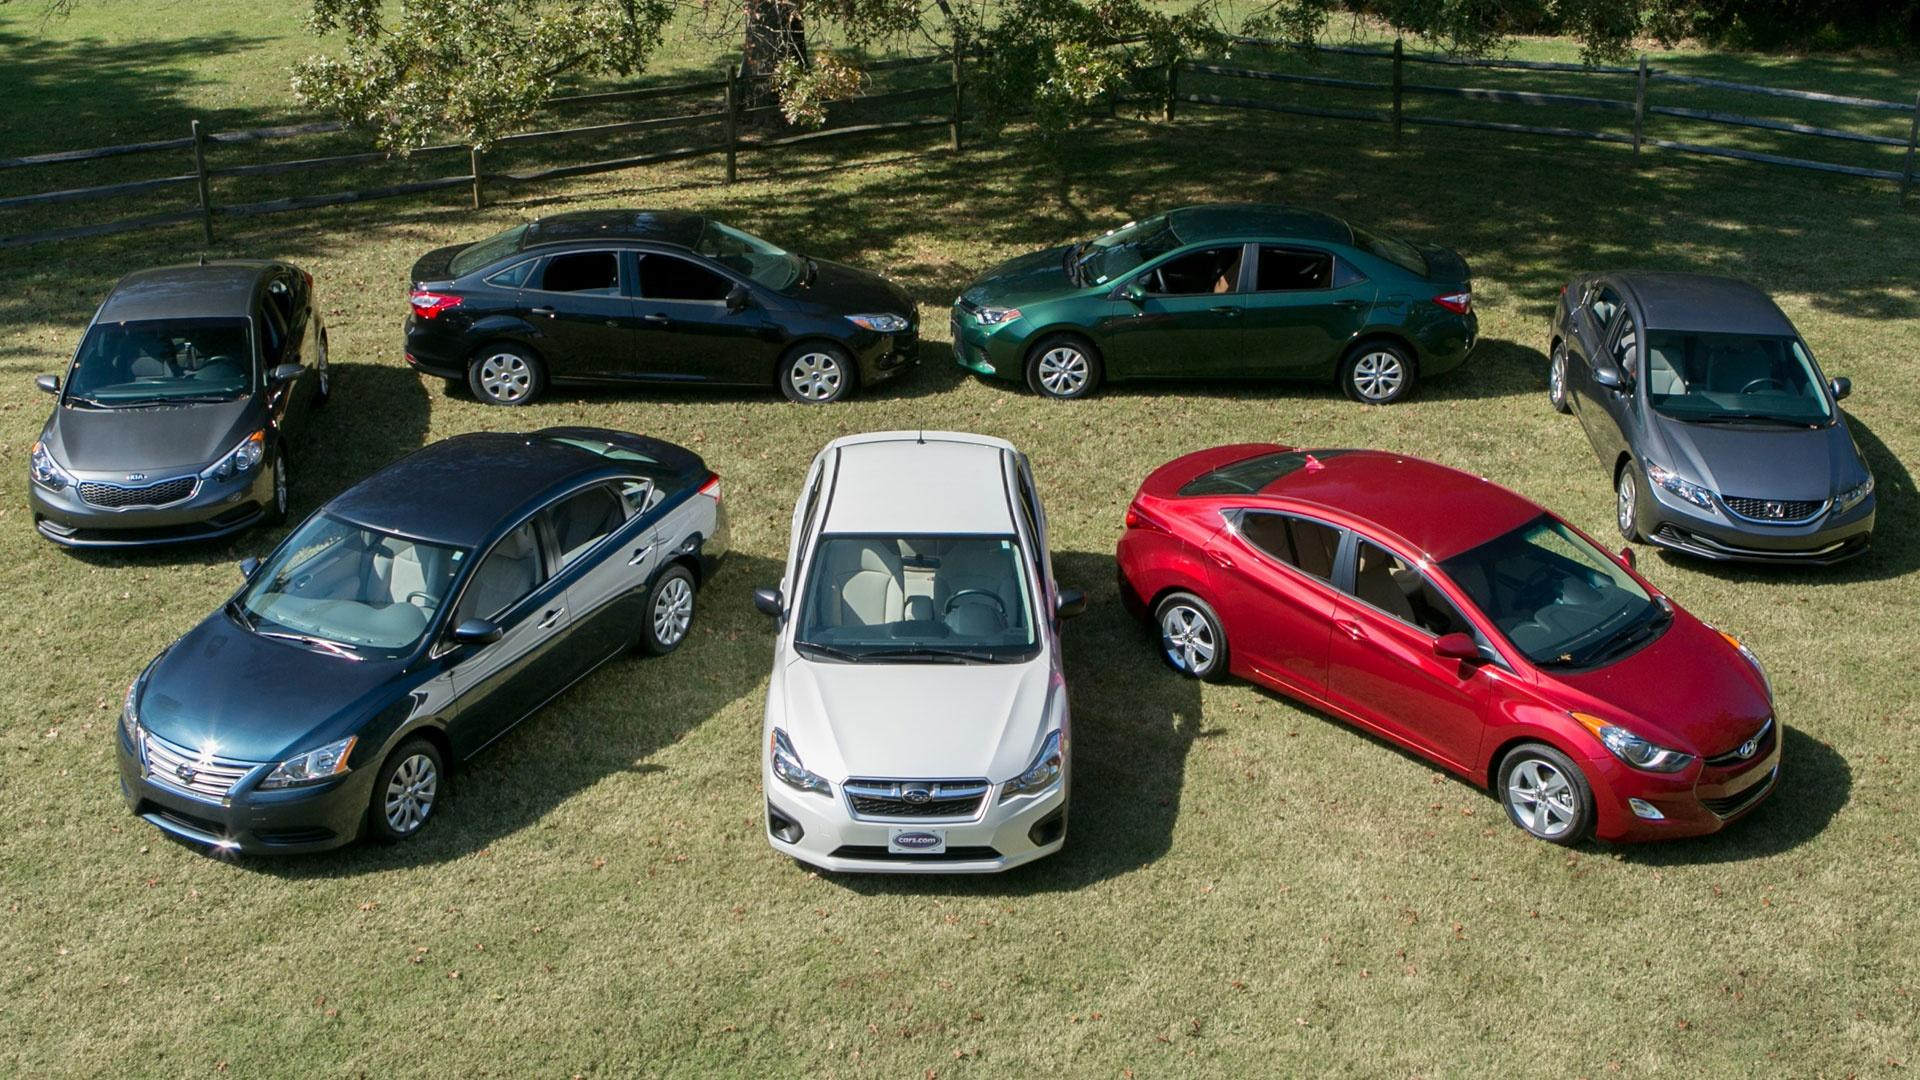 Compact Sedan Challenge & 2013 Chevrolet Sonic RS image